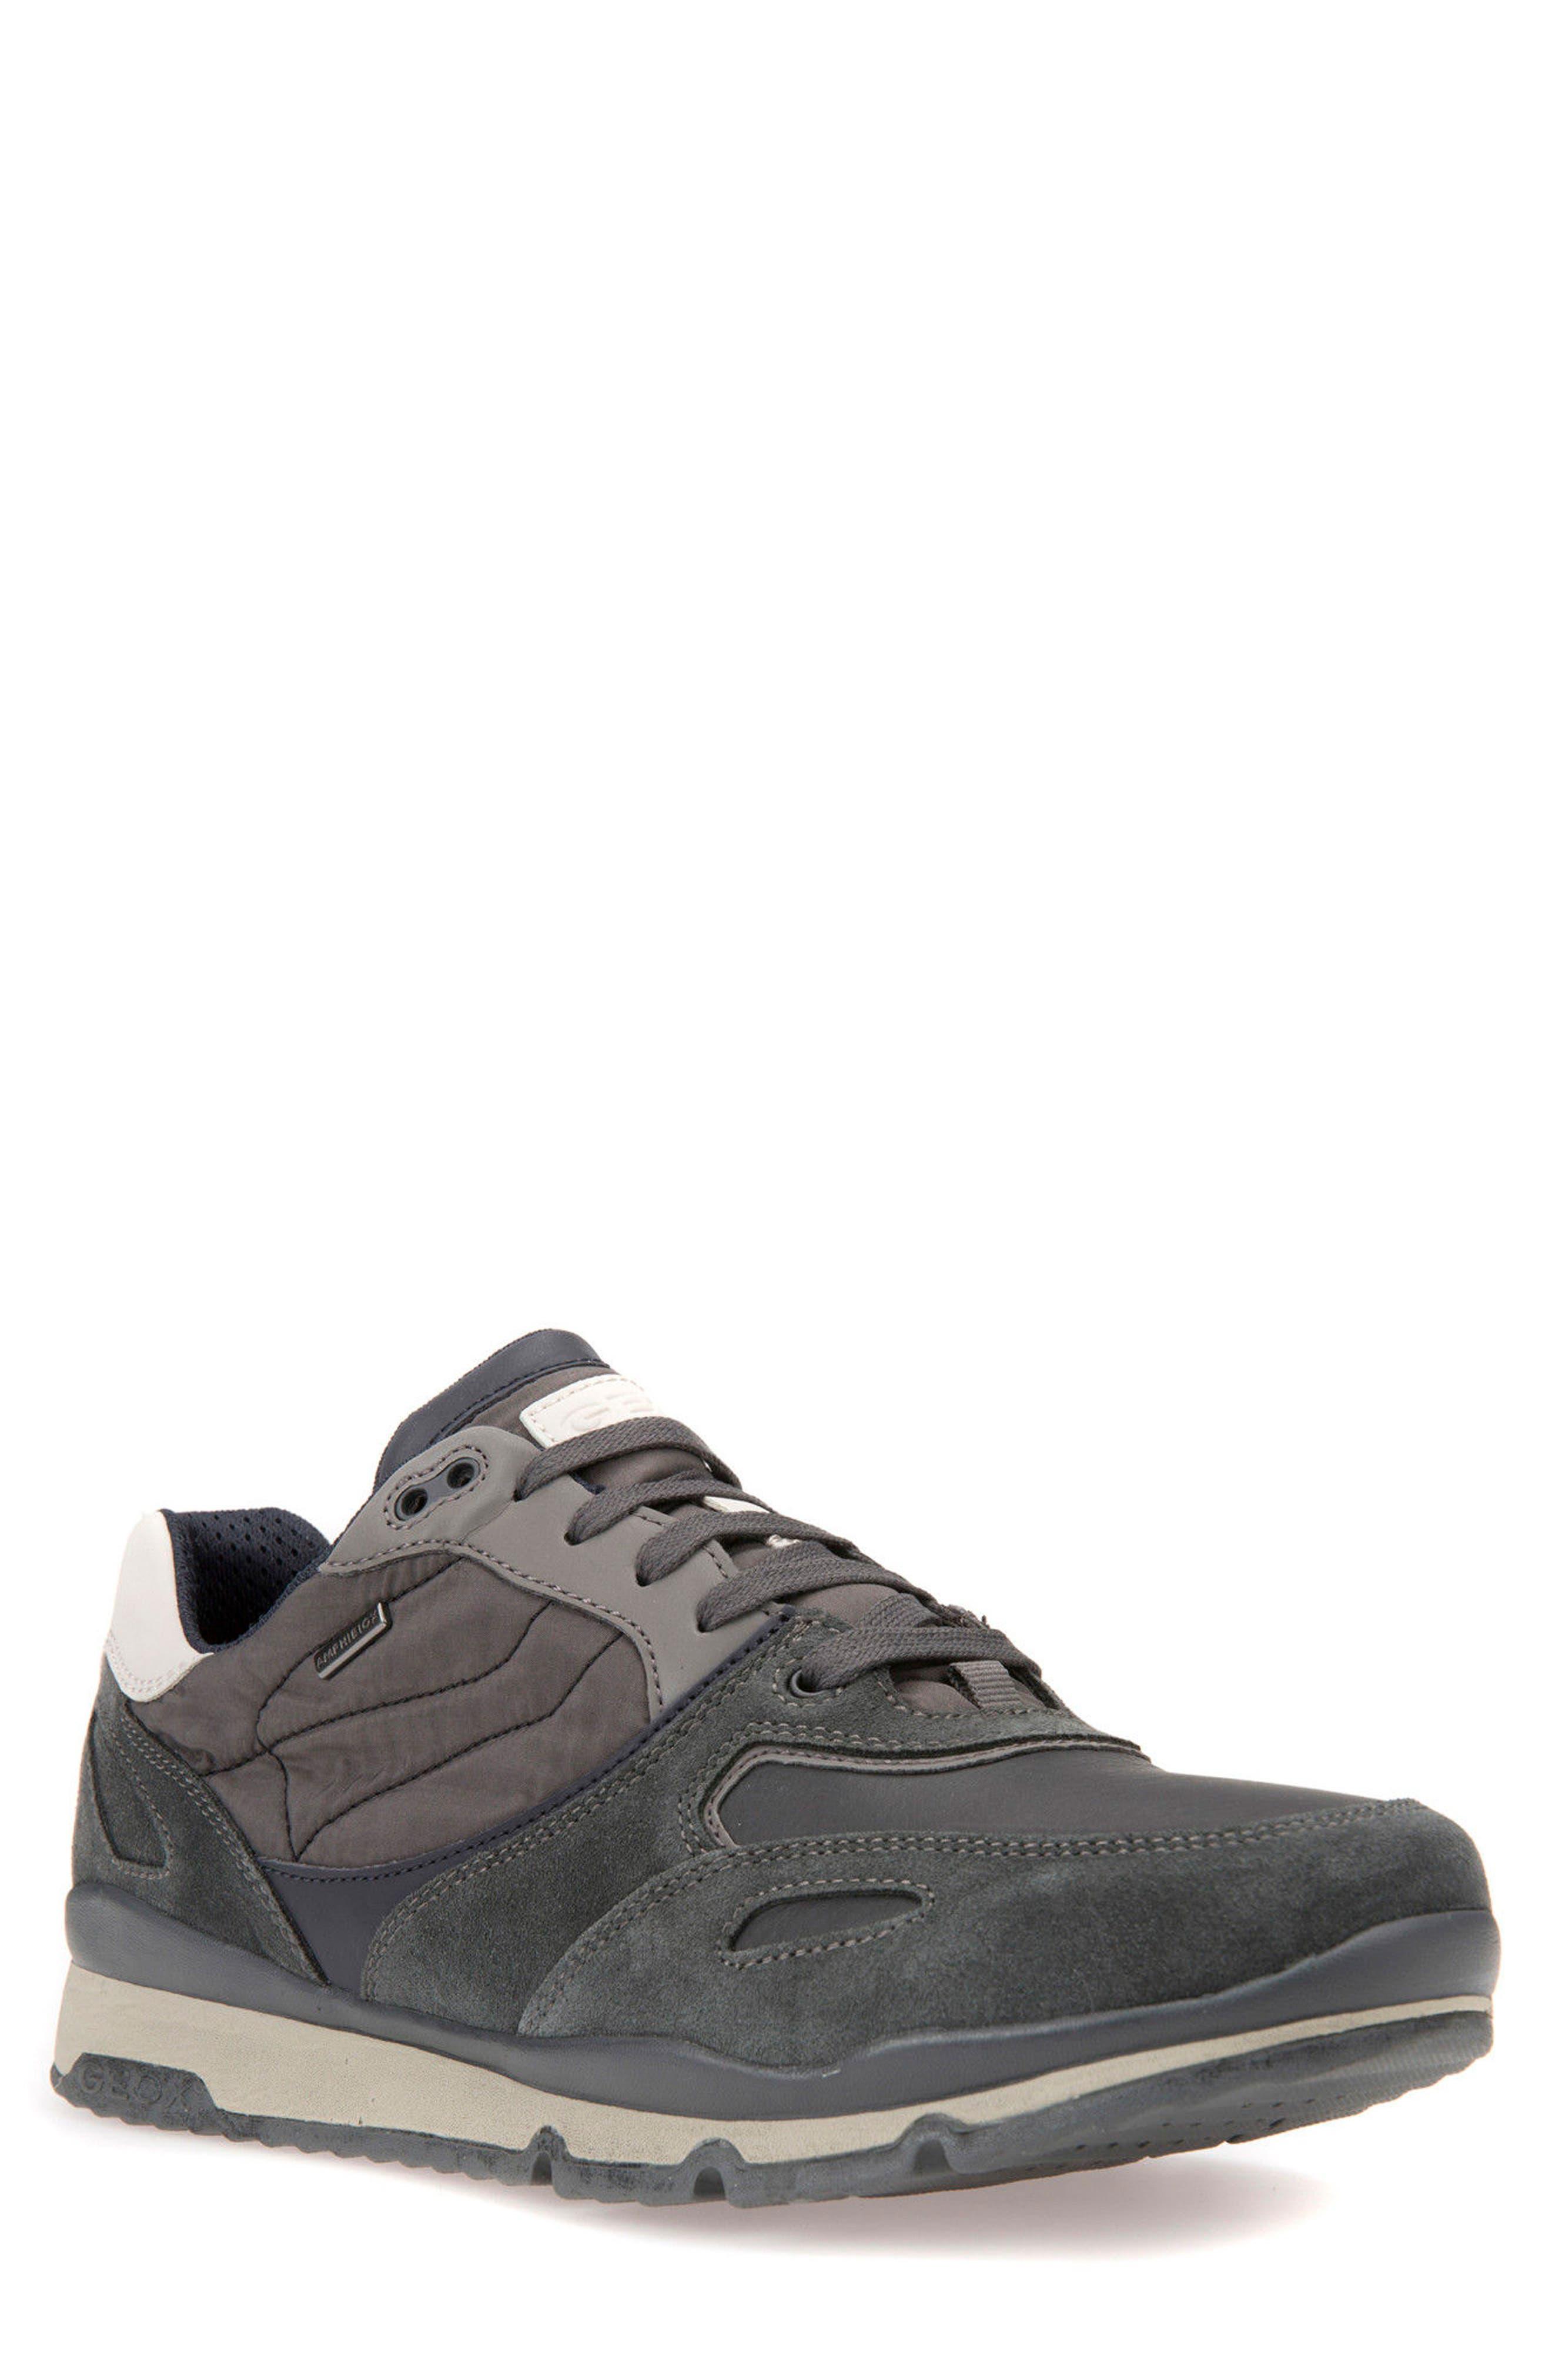 Geox Sandro ABX Ambphibiox Waterproof Sneaker (Men)